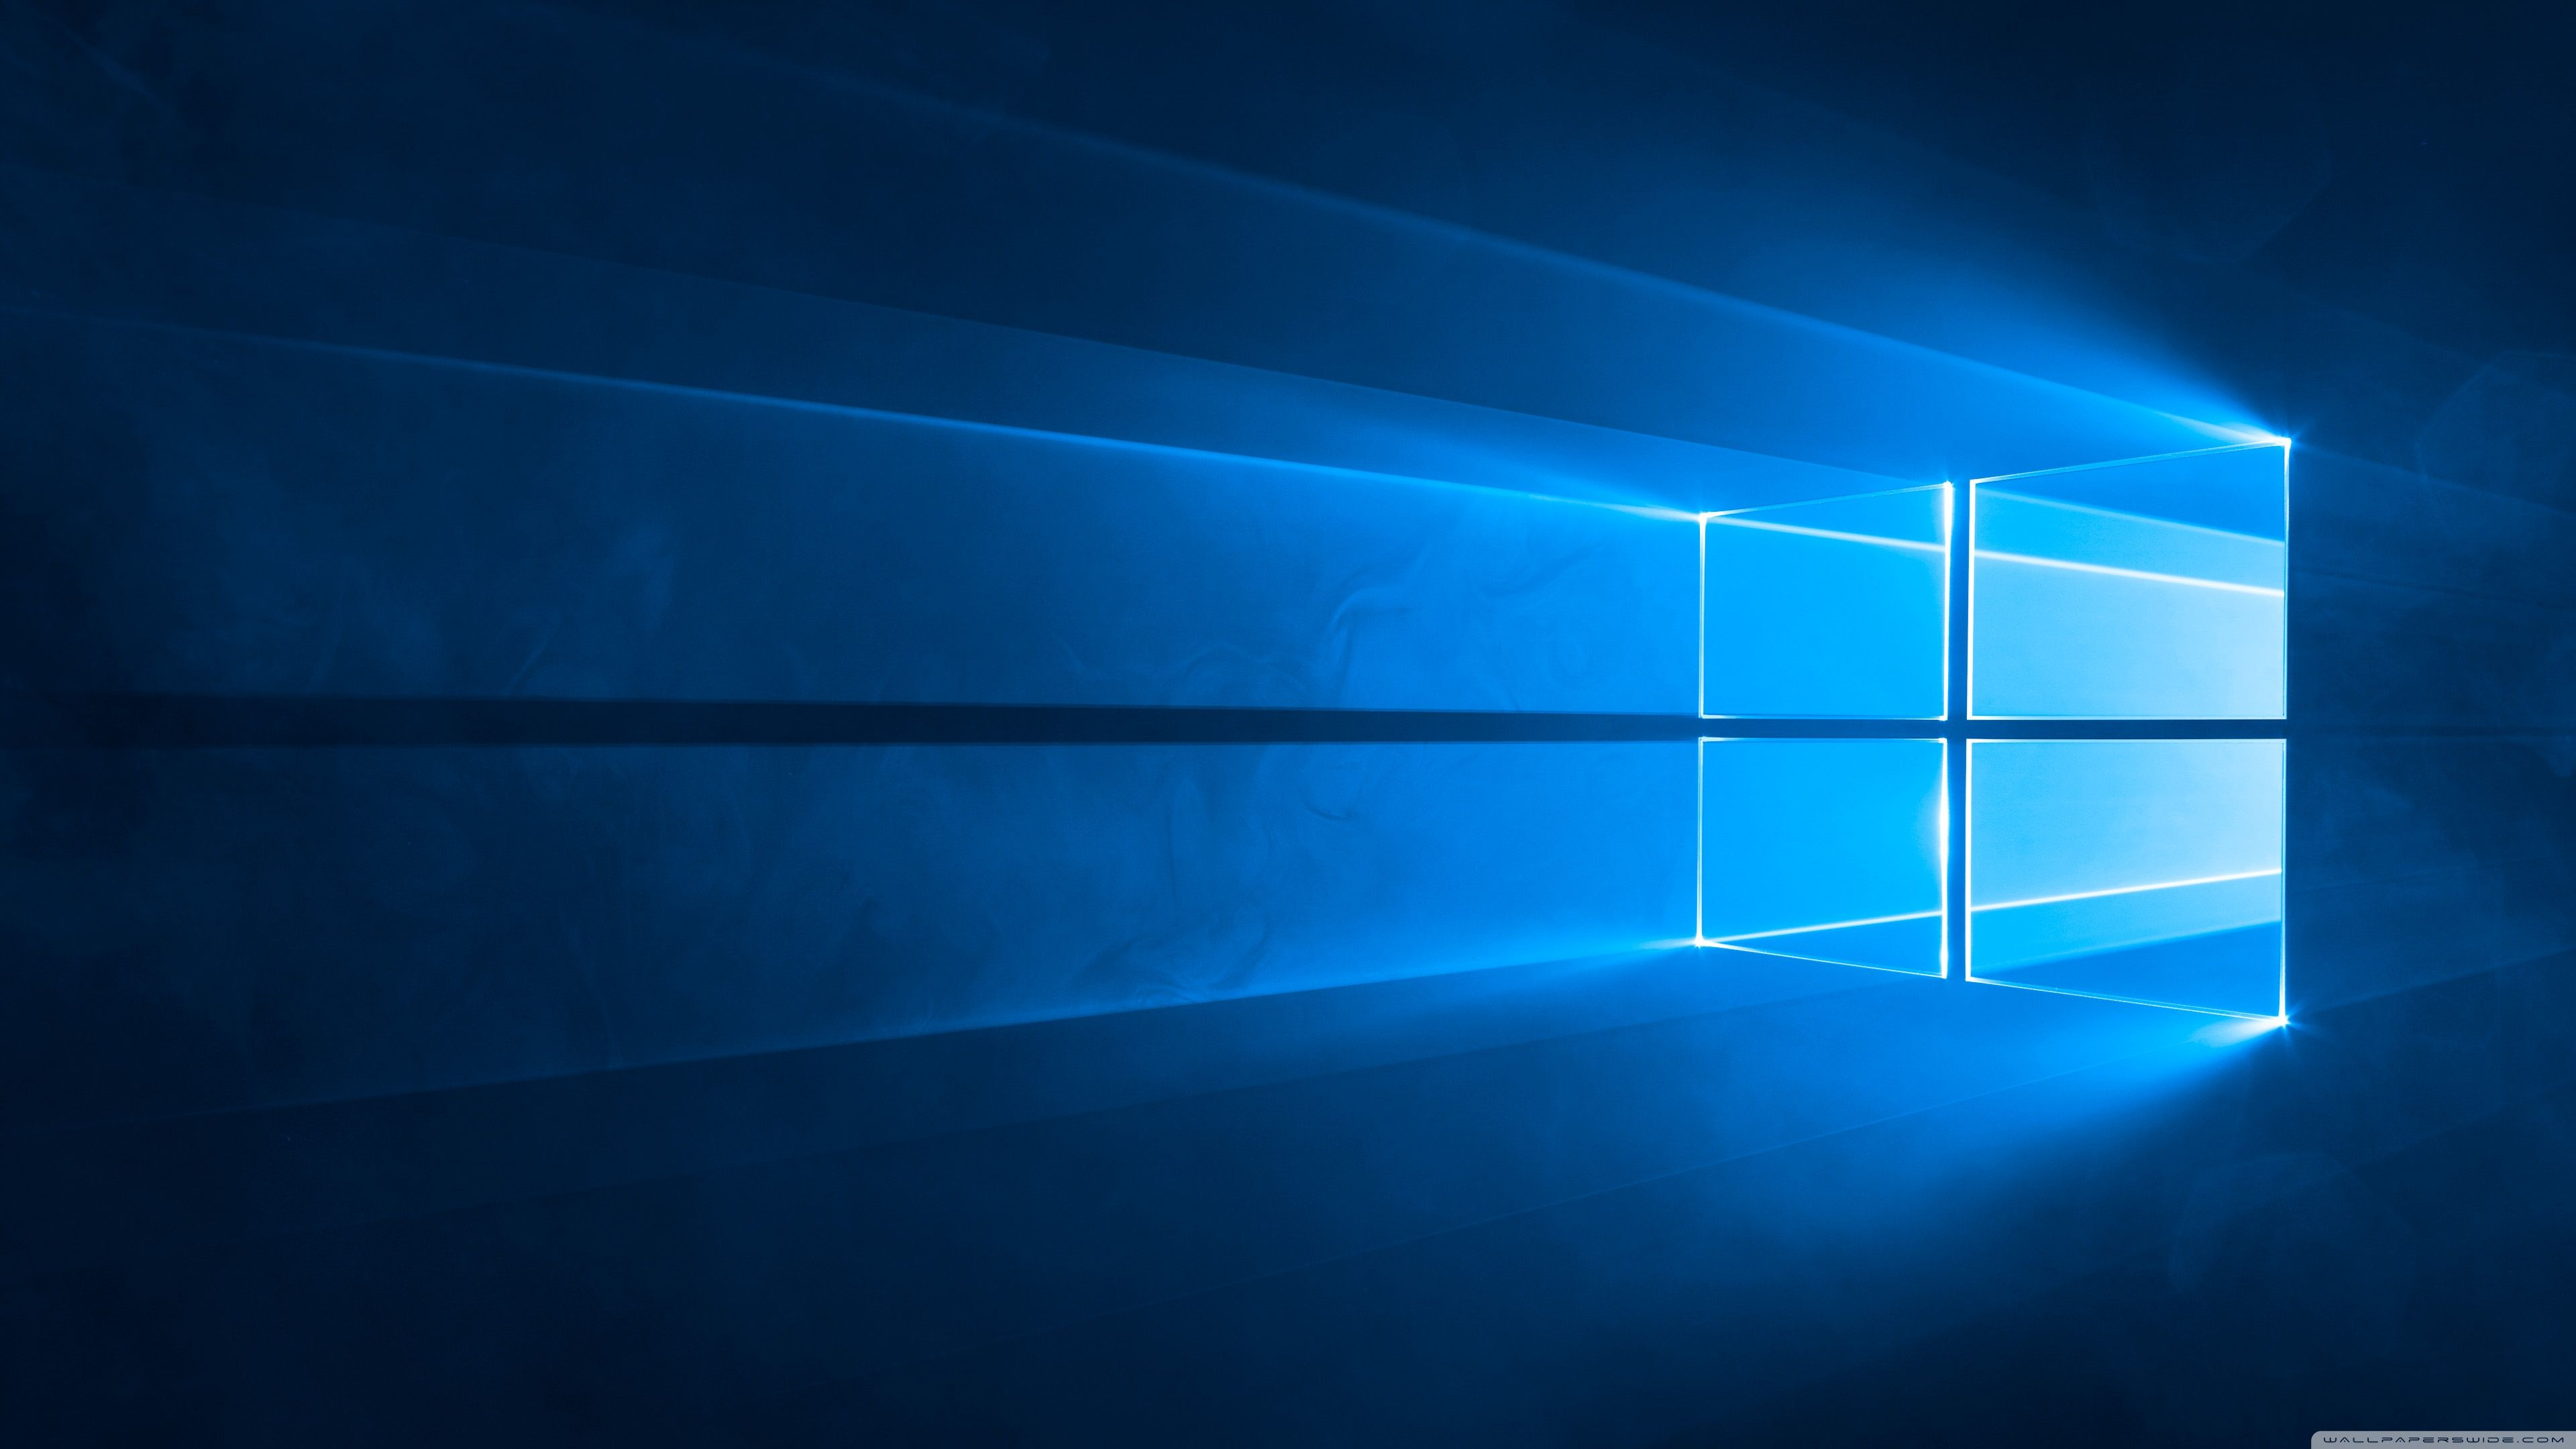 Windows 10 Wallpaper High Definition In 2019 Wallpaper